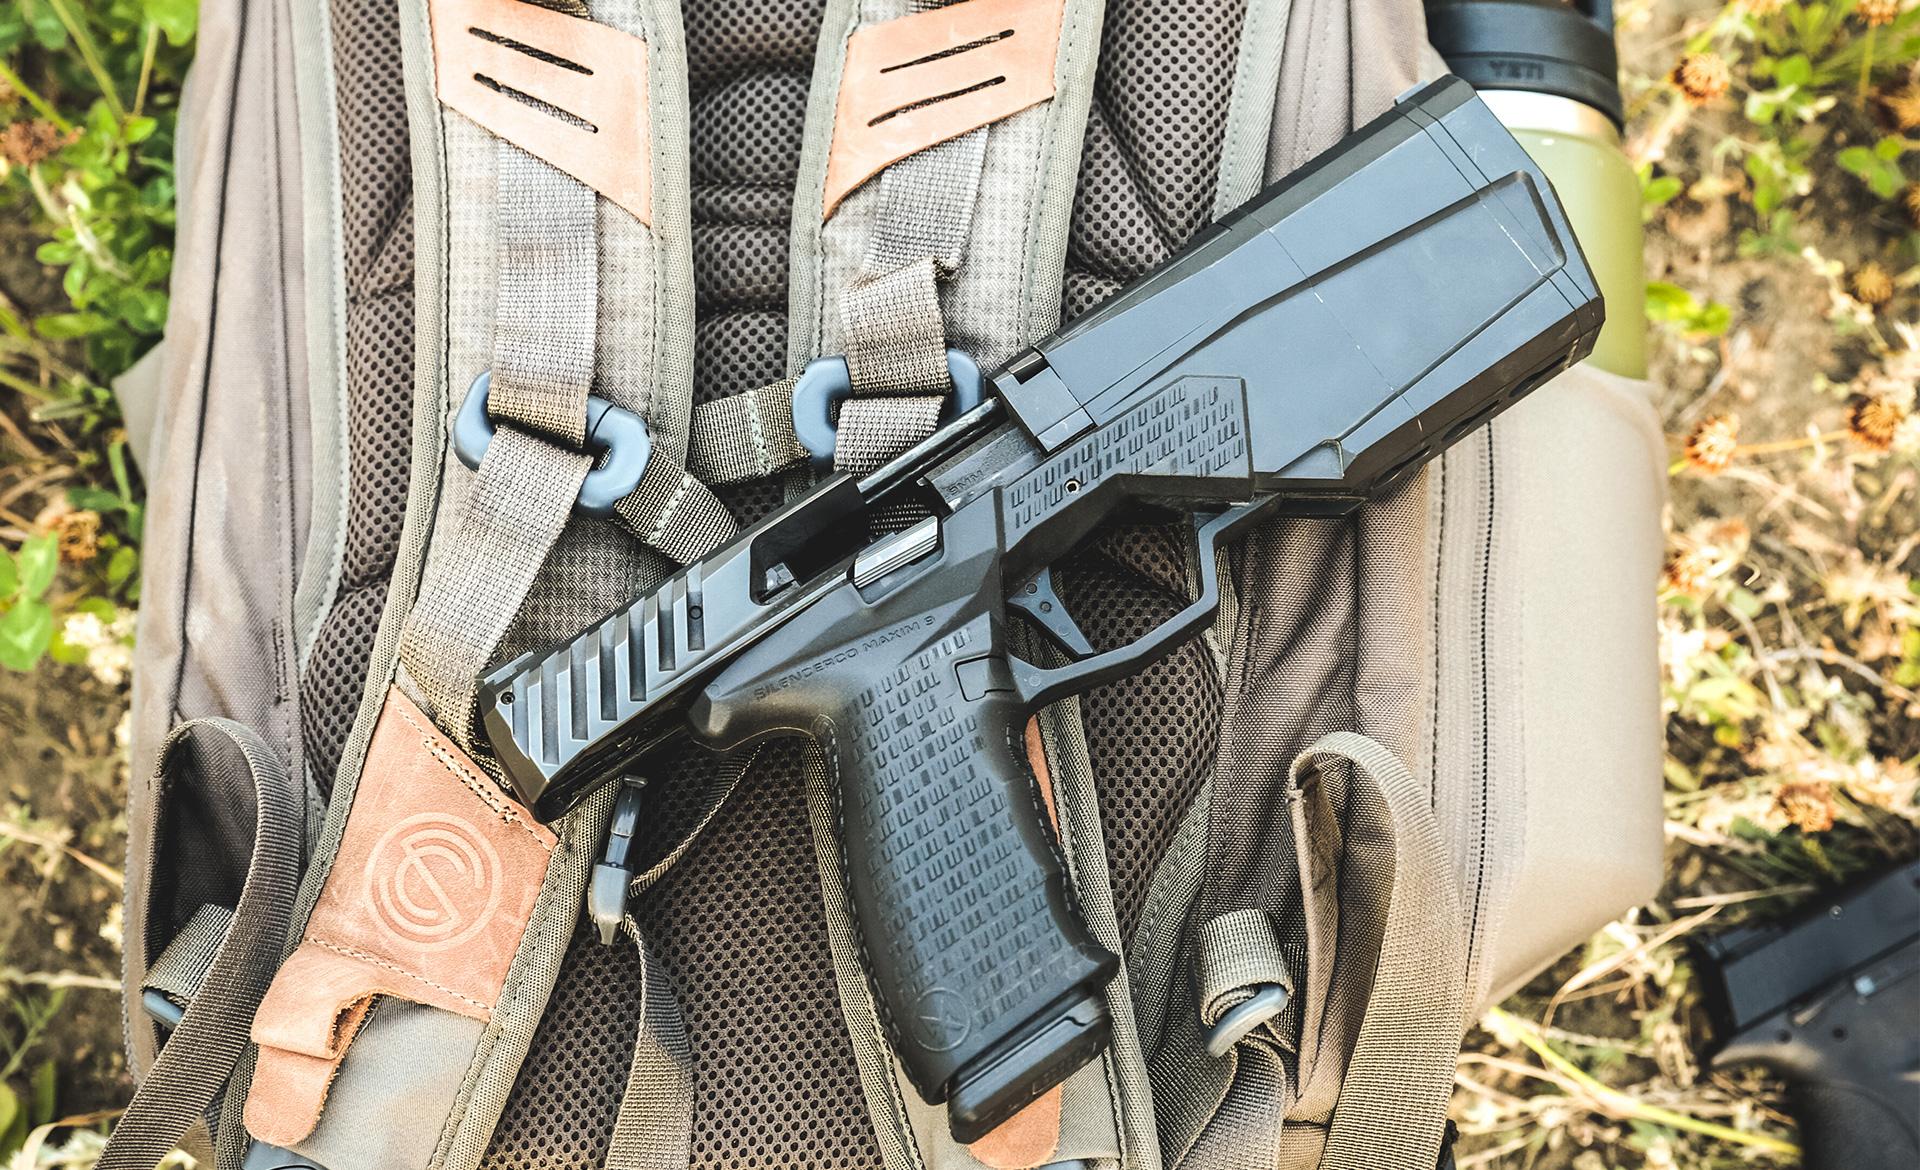 maxim 9mm handgun with integrated suppressor